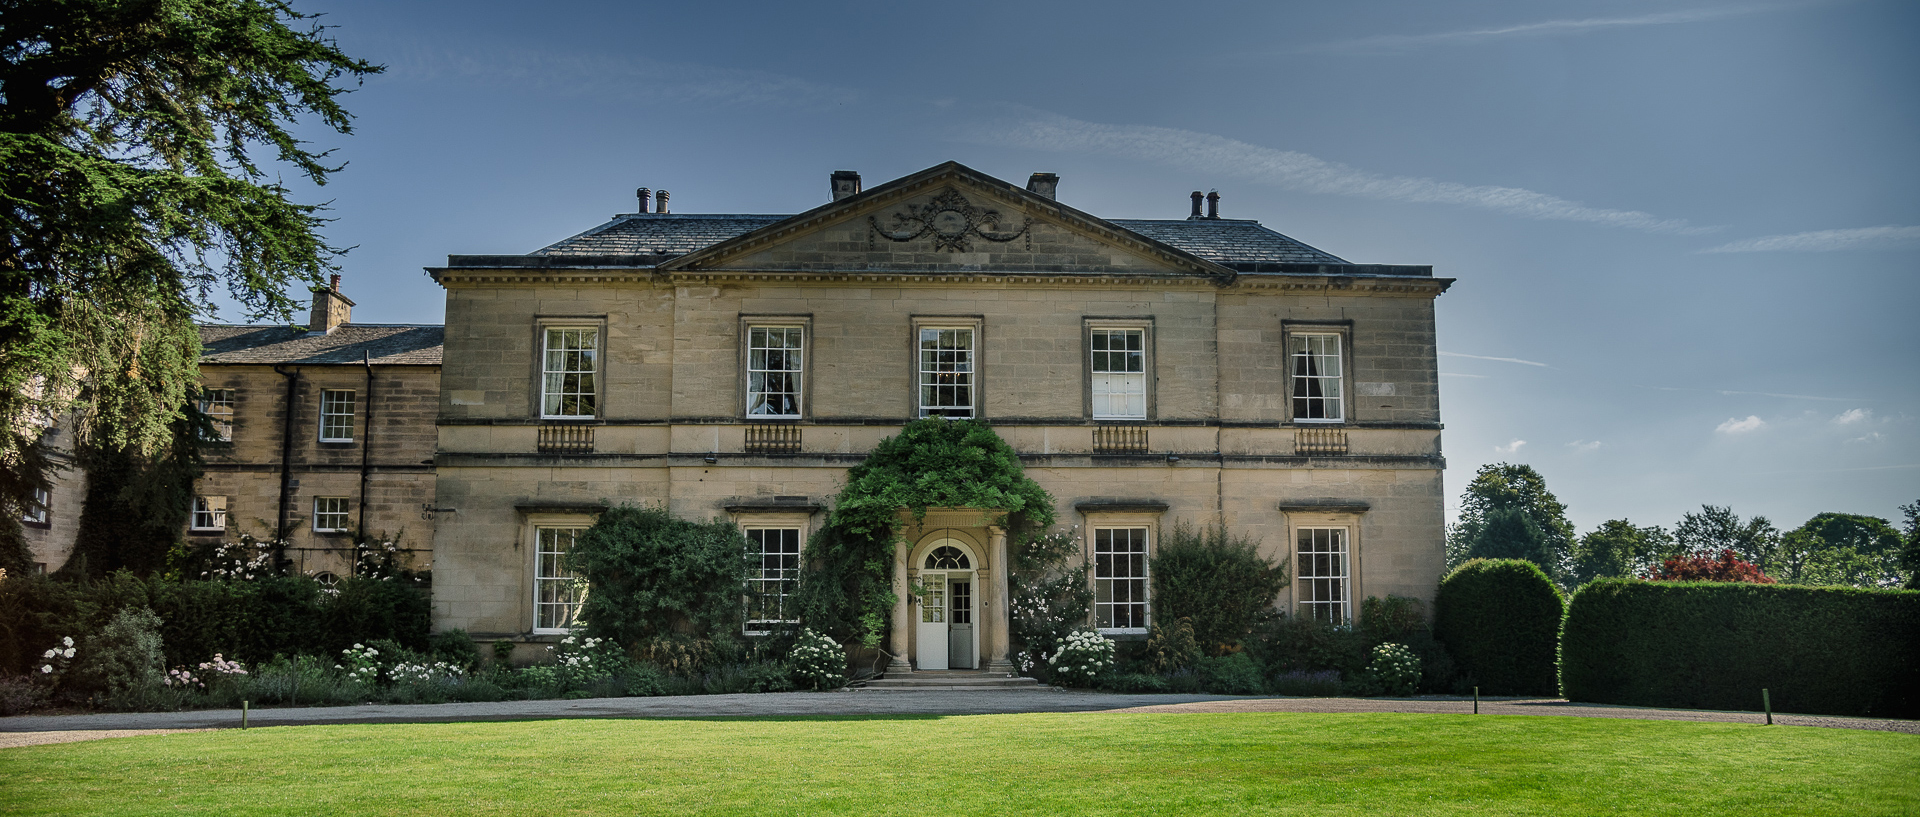 Top 5 Wedding Venues: Part 1 - Middleton Lodge